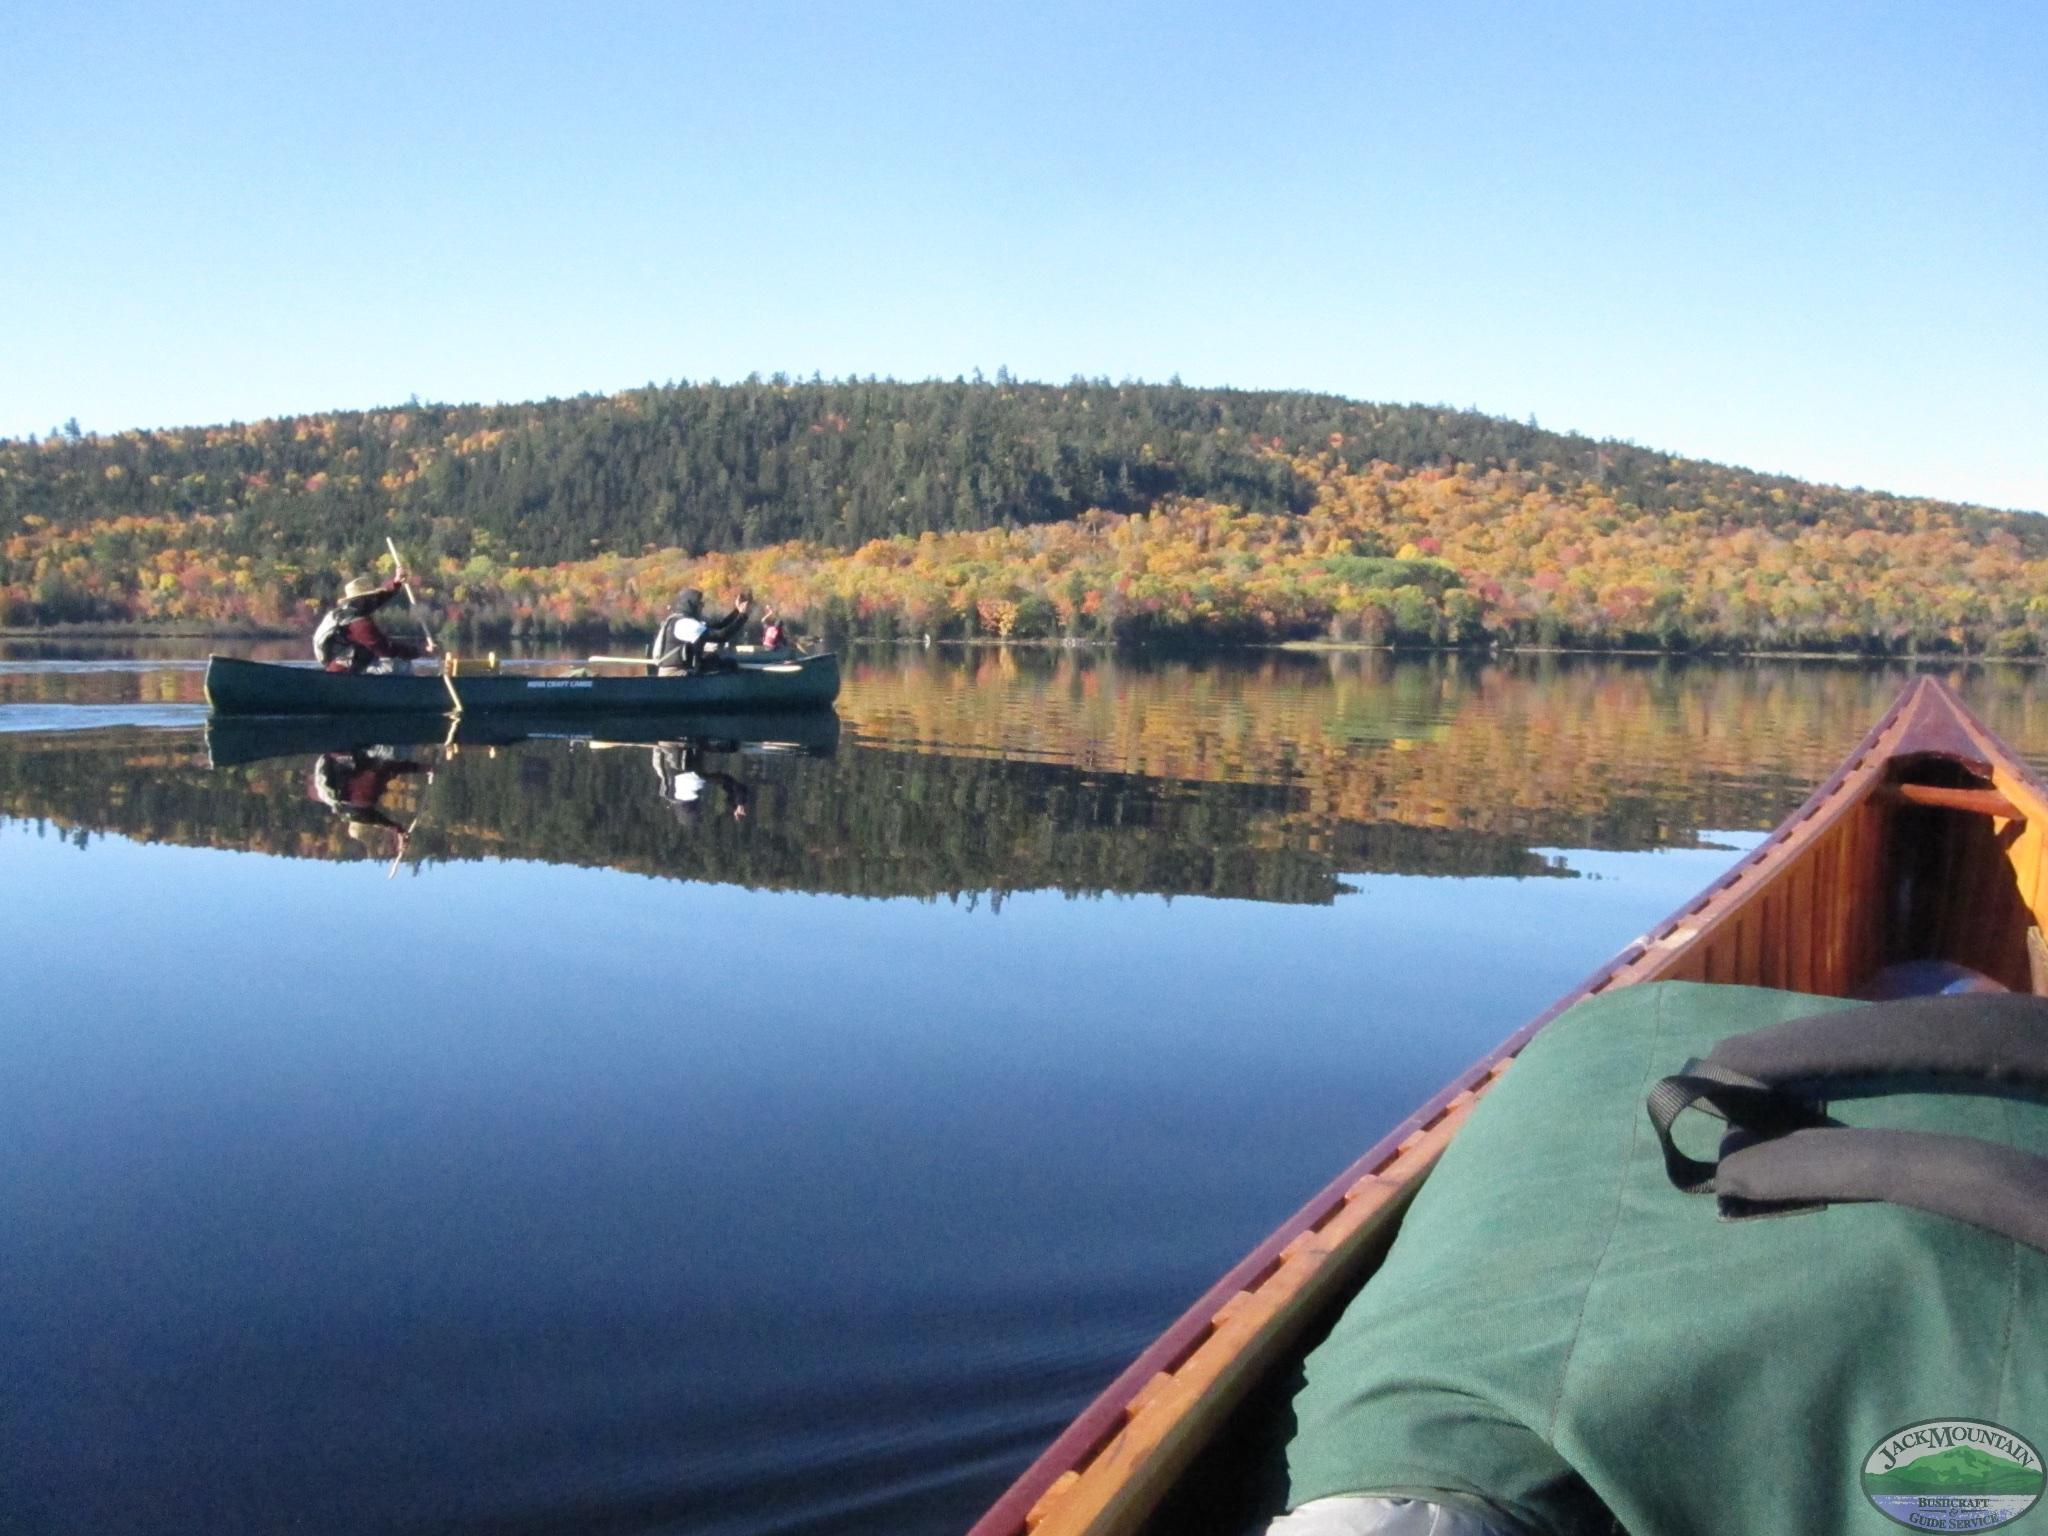 Canoeing Reflection